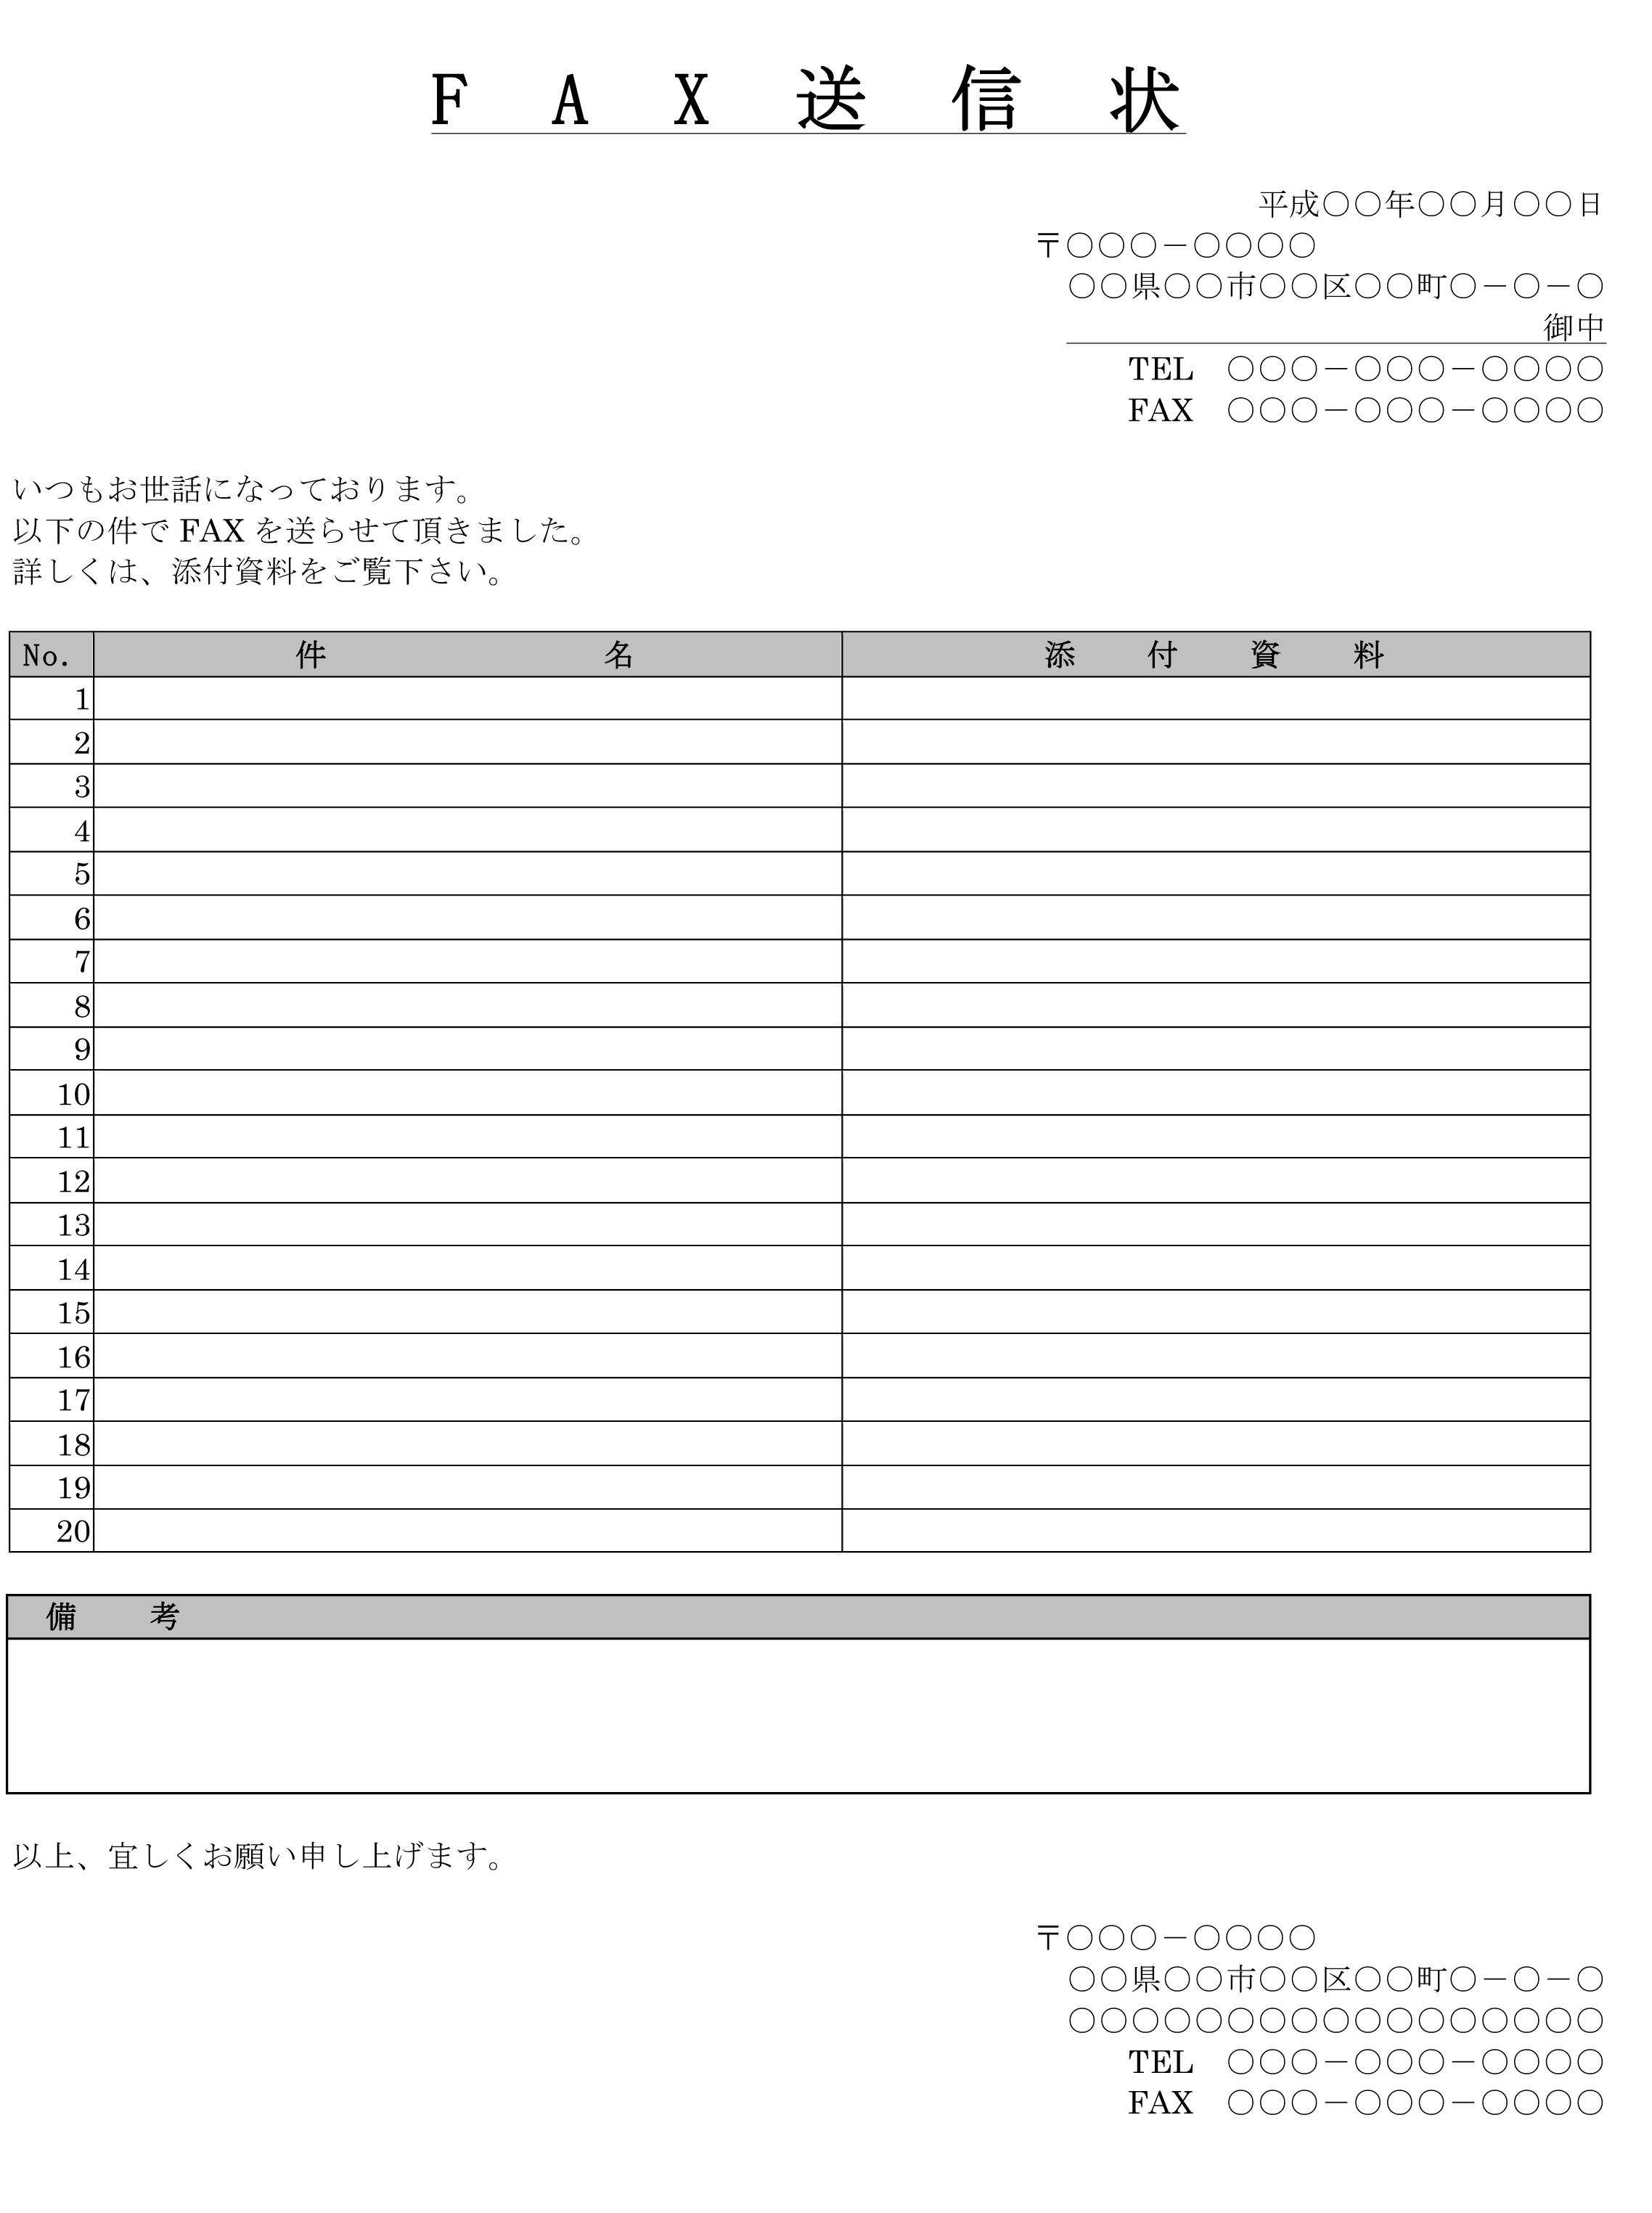 fax送信状_6